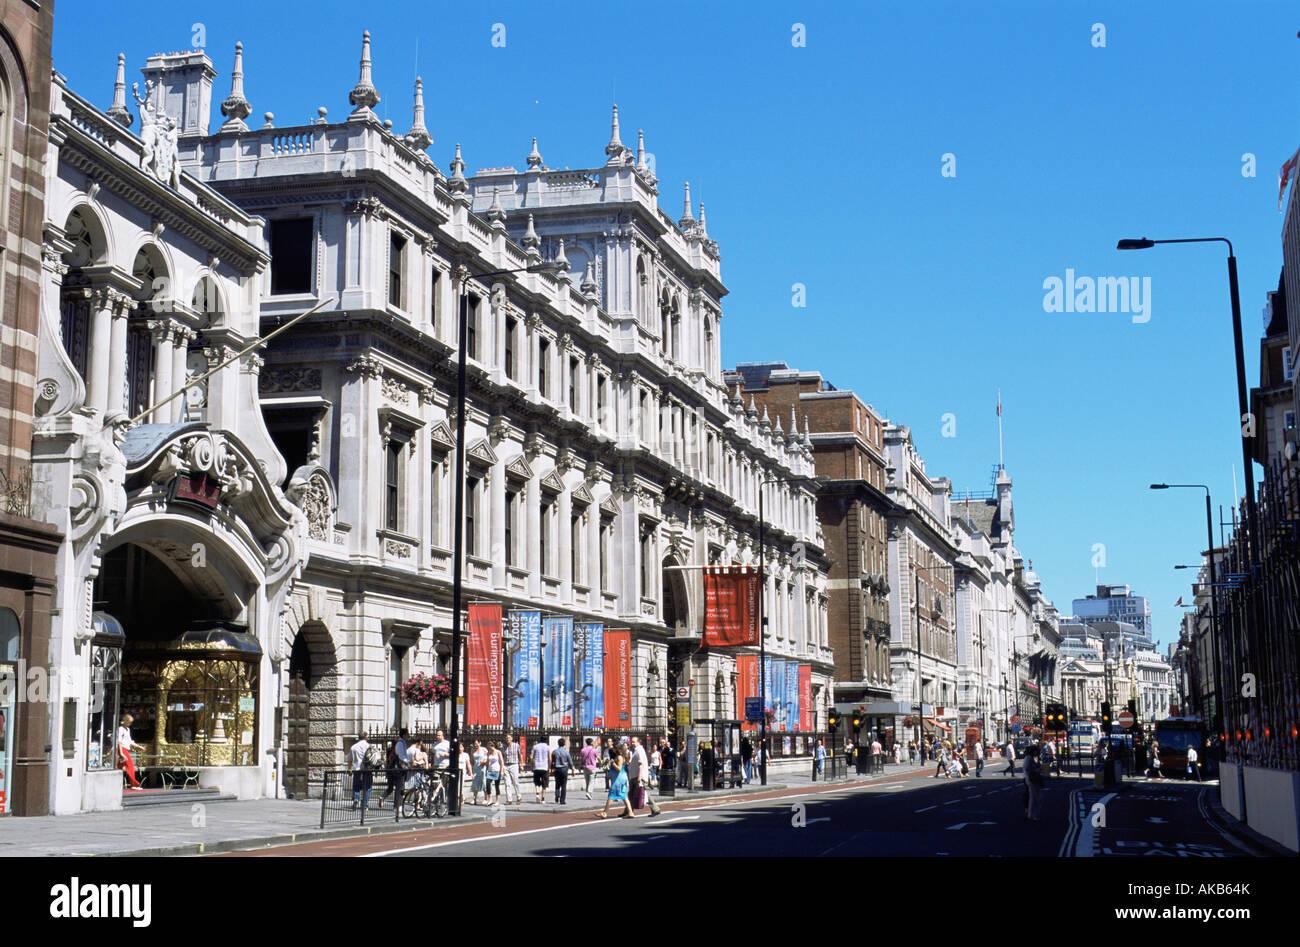 England, London, Picadilly - Stock Image